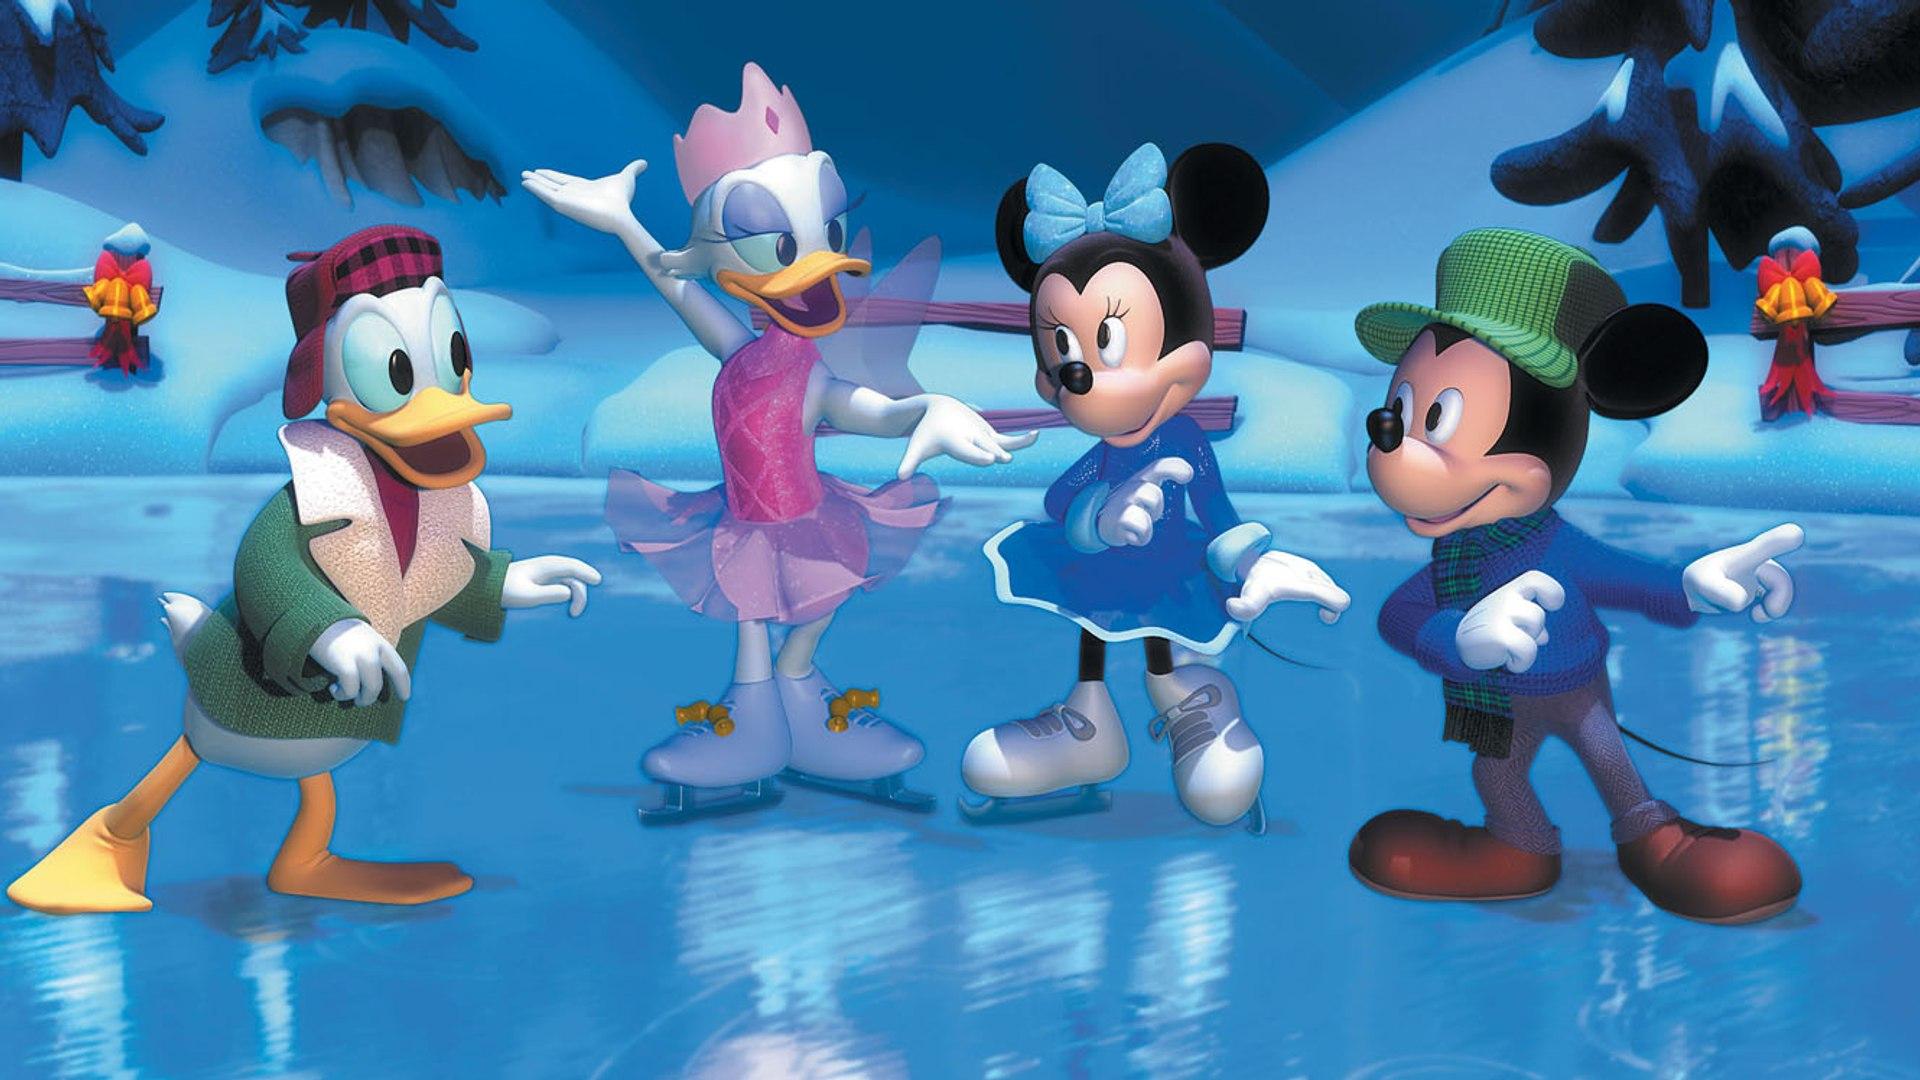 Mickeys Once Upon A Christmas.Mickey S Twice Upon A Christmas Movie Animation Movies 2015 Full Movies Hd